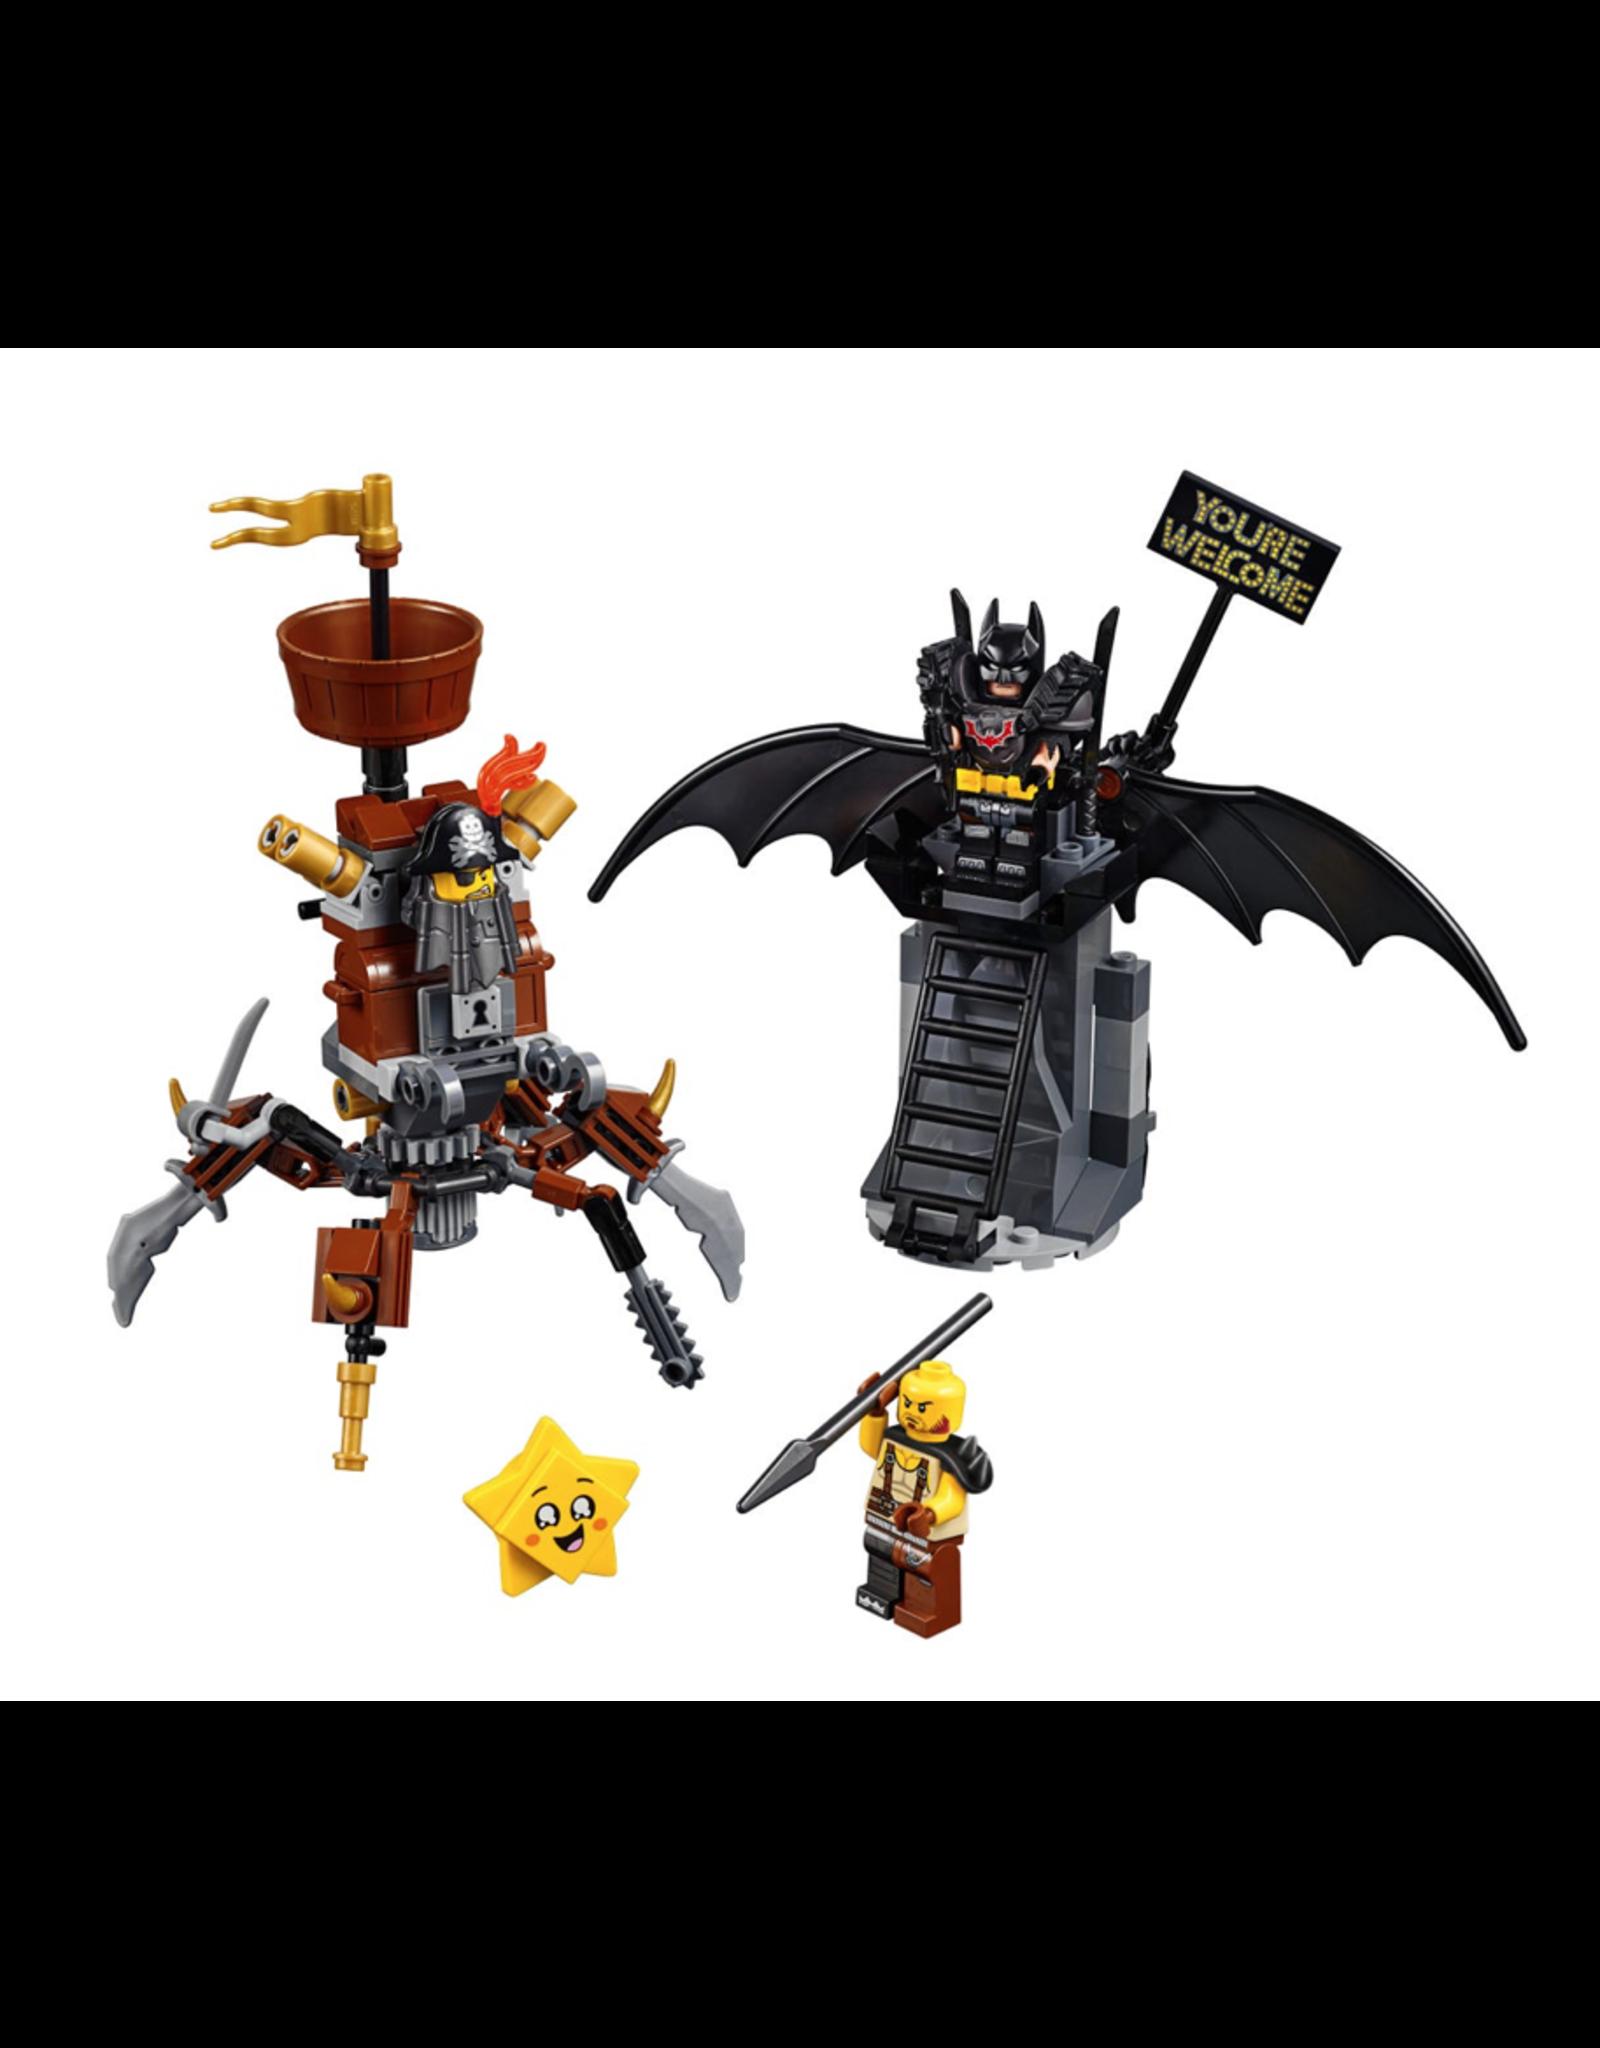 LEGO® LEGO® Movie 2 Battle-Ready Batman™ and MetalBeard